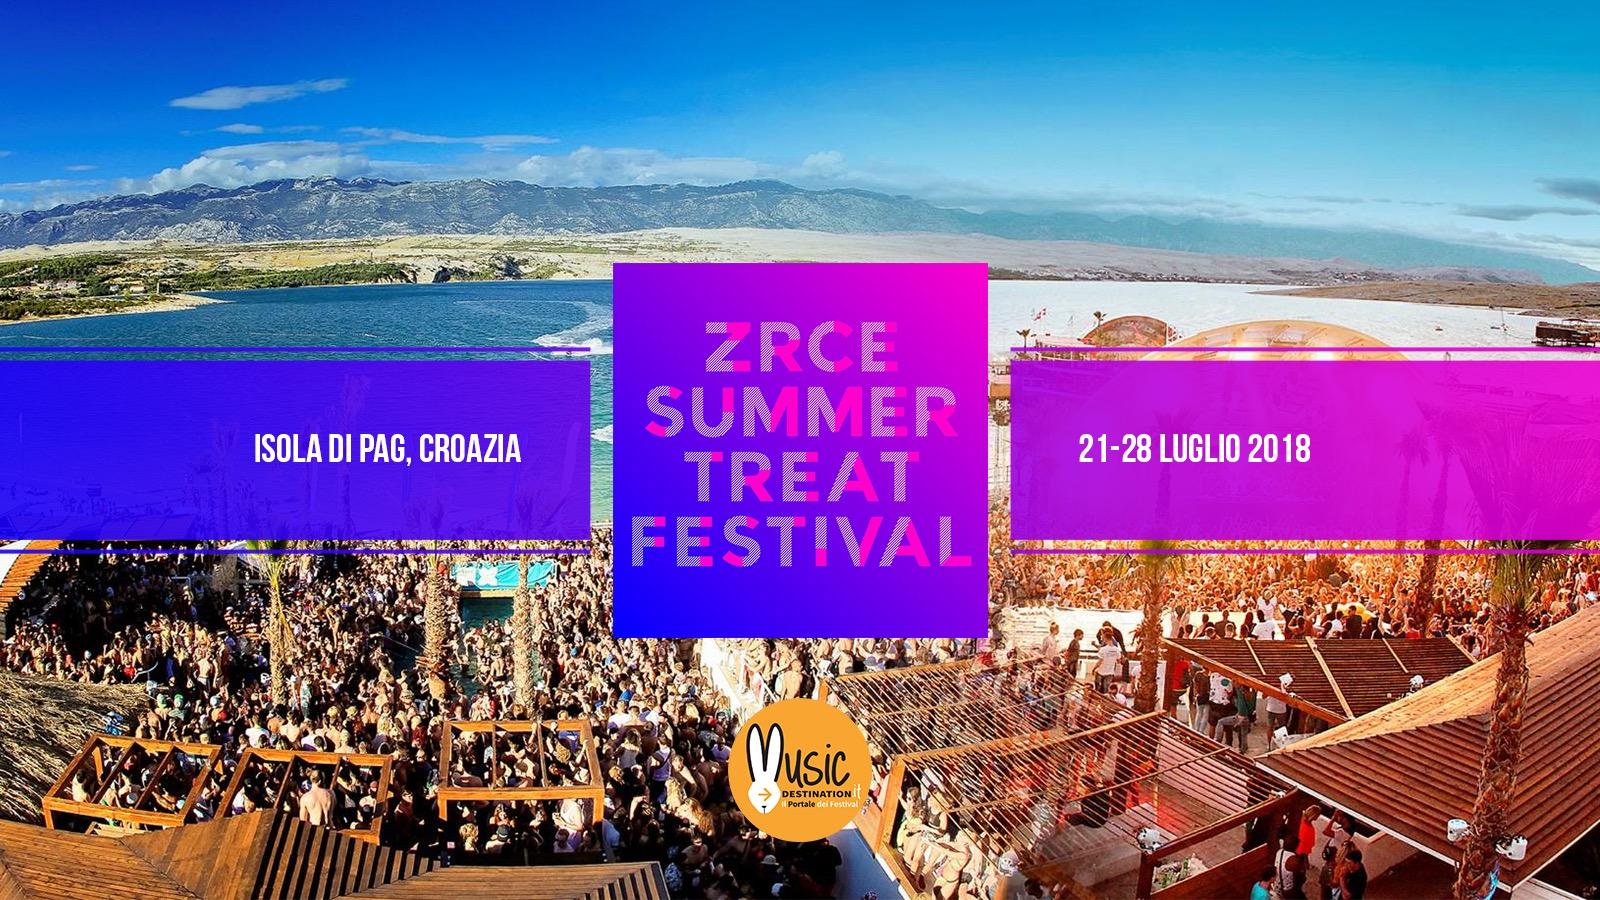 summer treat pag 21-28 luglio